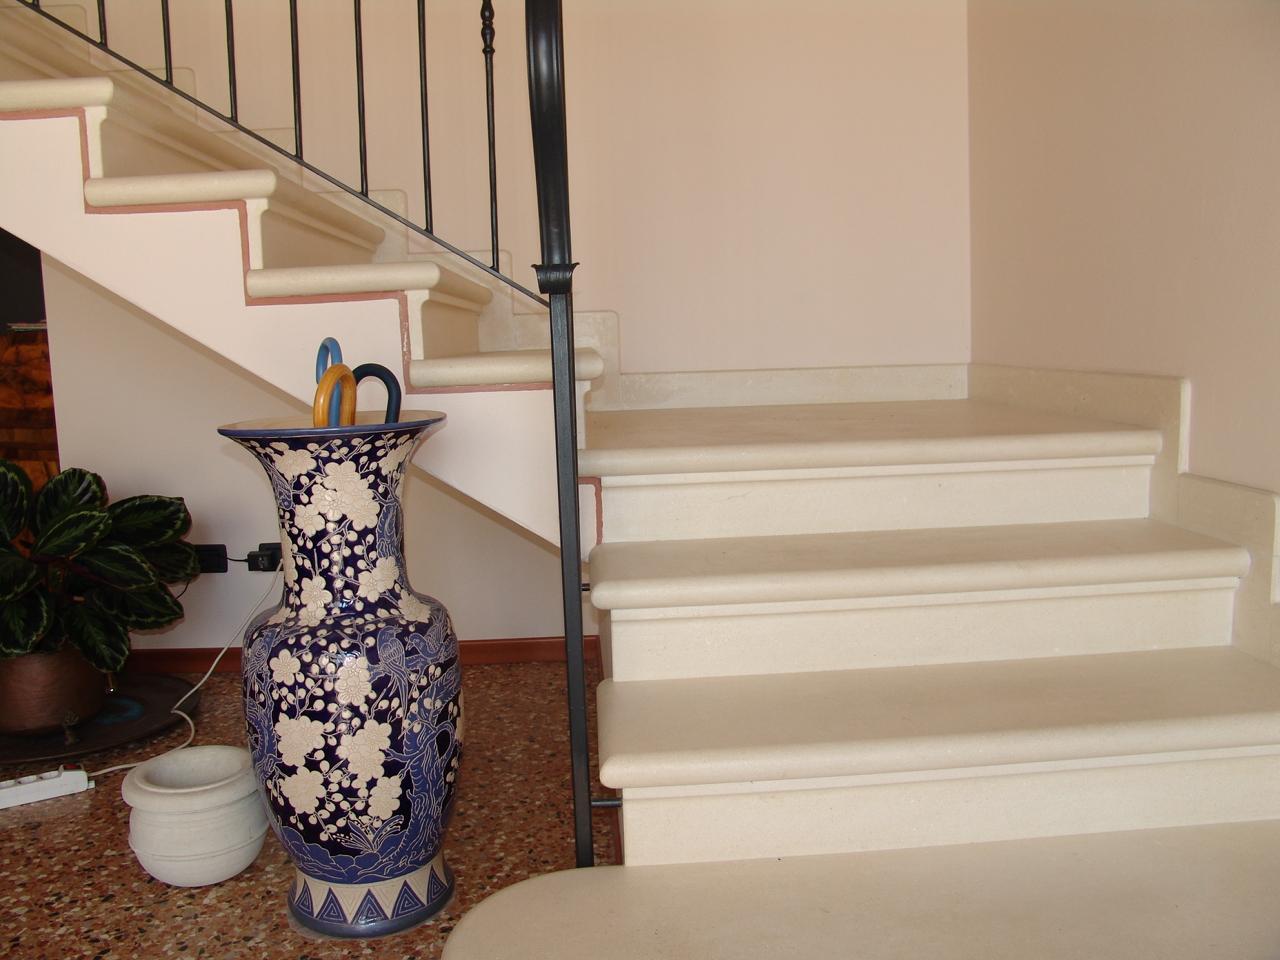 Trendy pietra di vicenza with tipi di scale interne - Scale interne in marmo ...